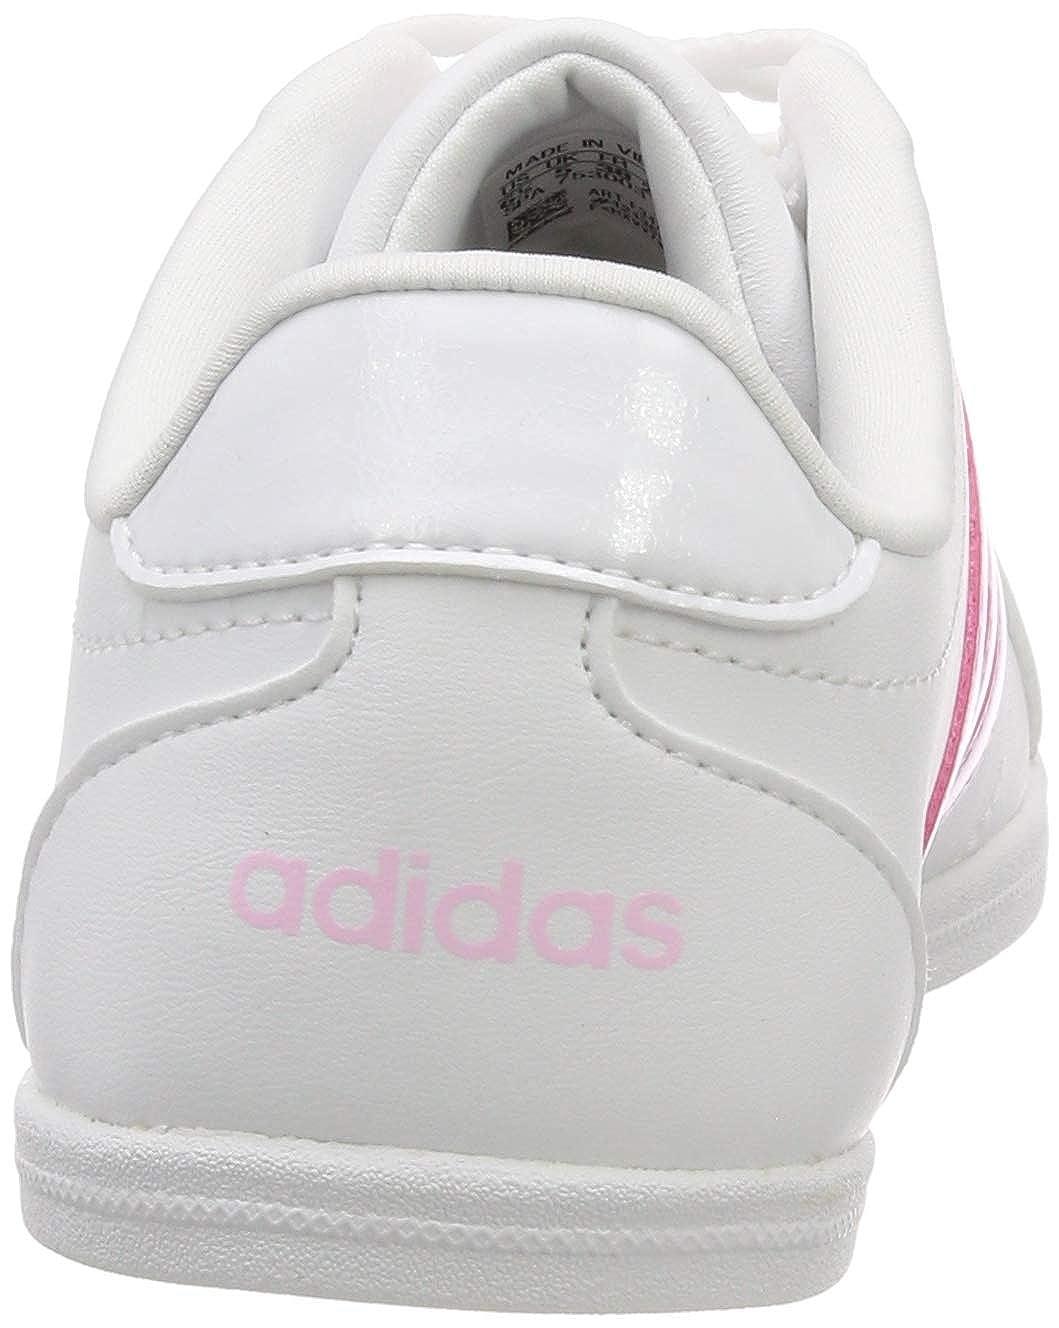 best service 63228 2be72 Adidas Damen Coneo QT Fitnessschuhe Amazon.de Schuhe  Handta